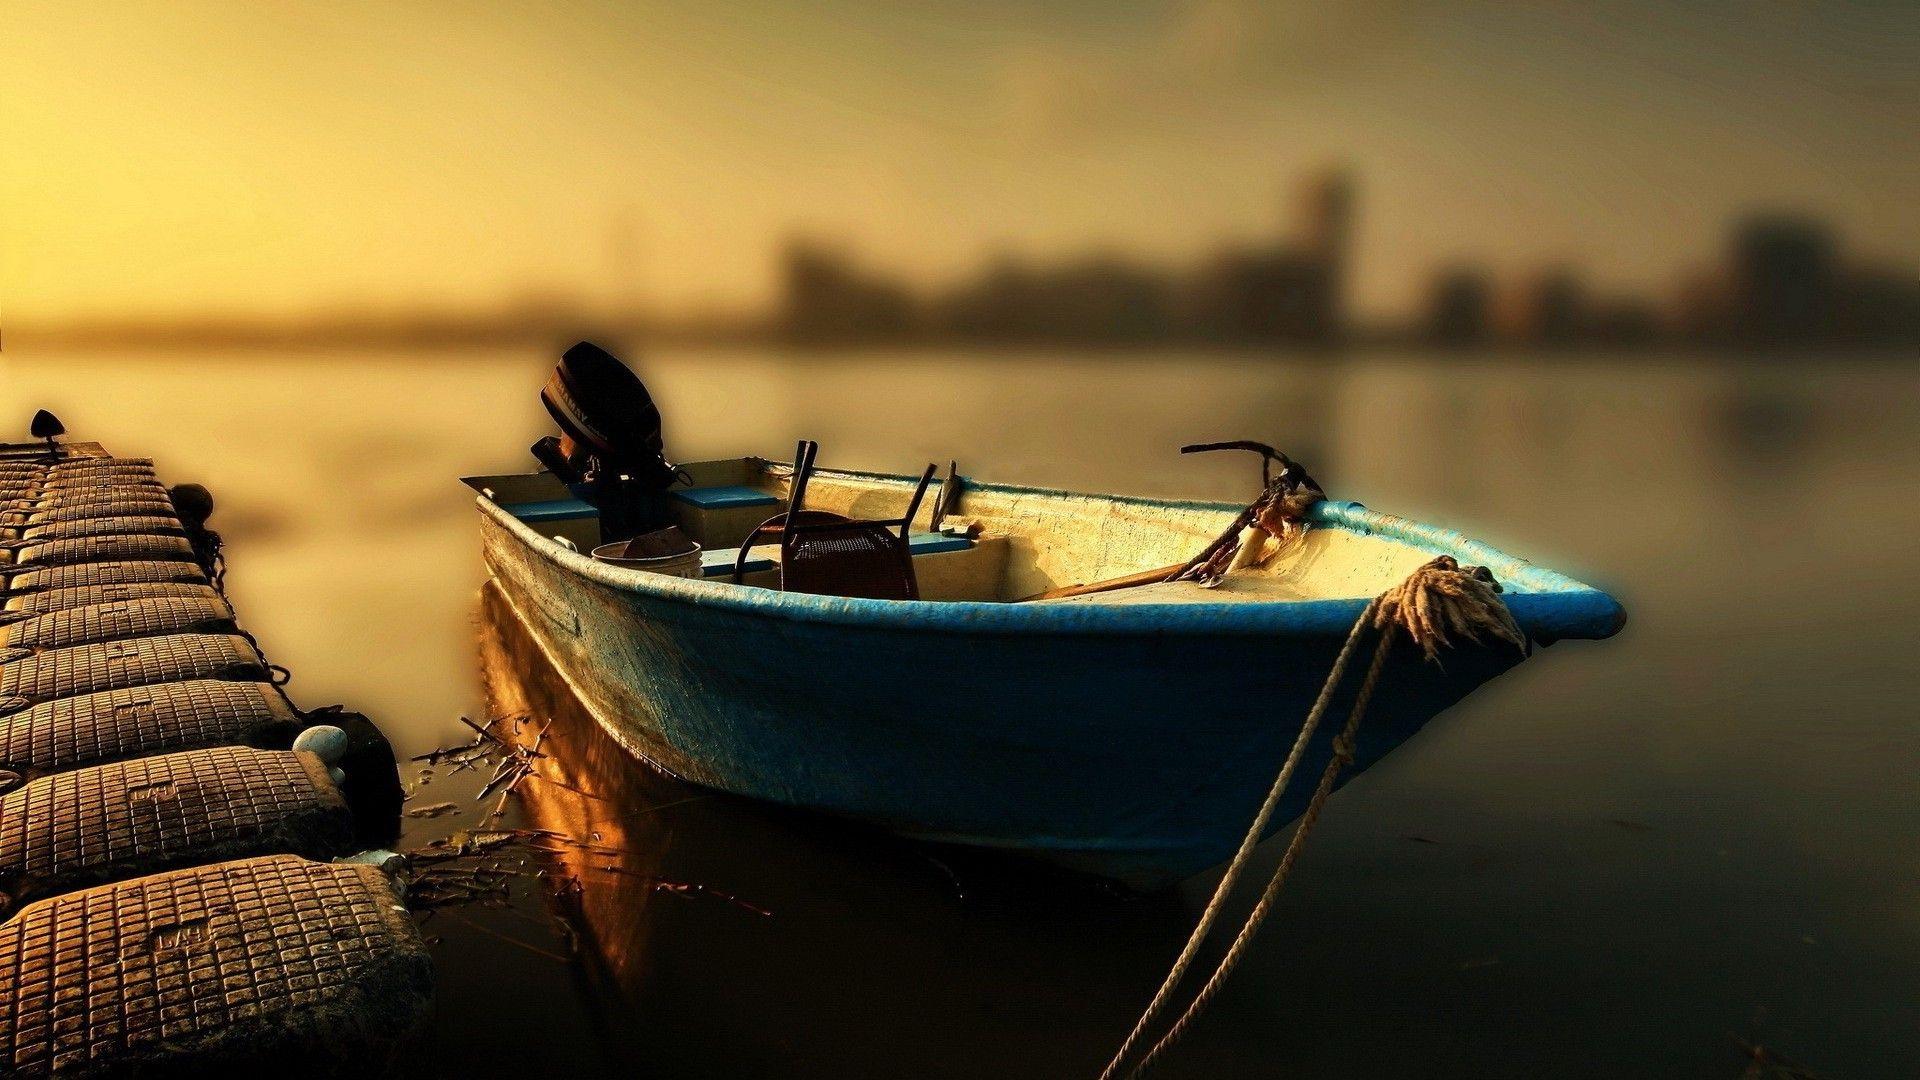 Fishing Boat At Sunset Hdr Hd Desktop Background Wallpaper Free Google Socialismo